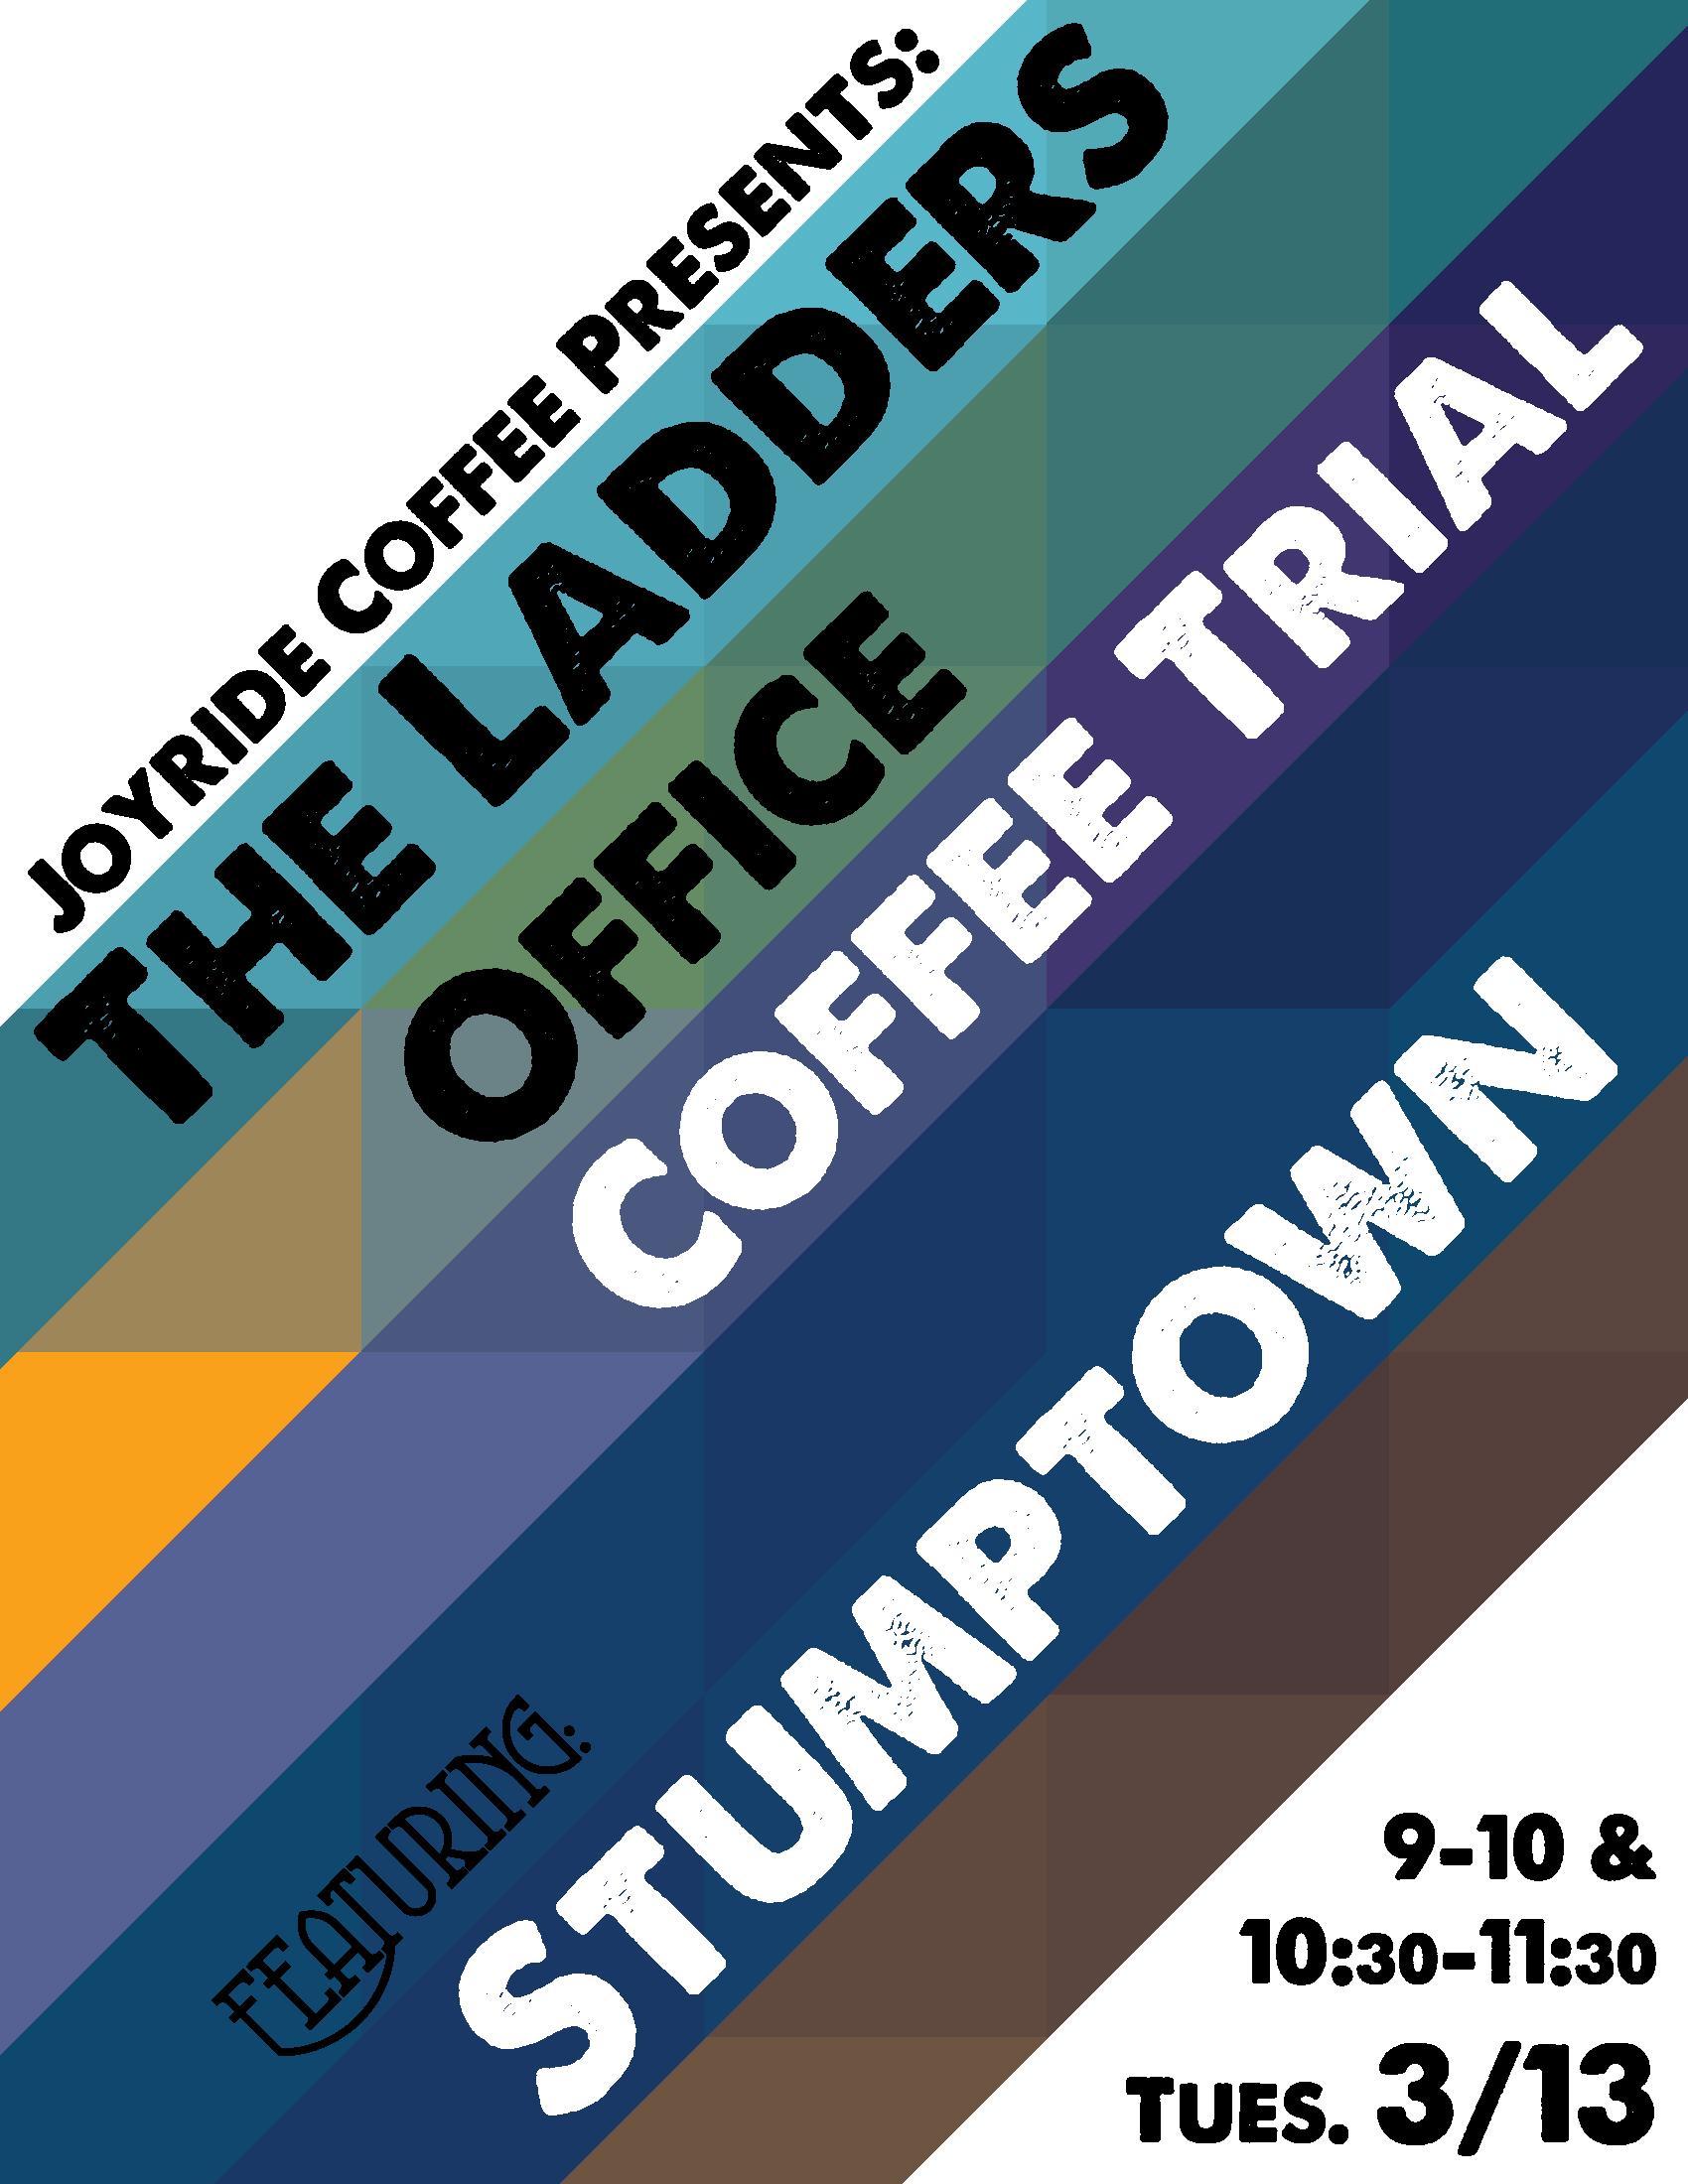 The Ladders Joyride Office Coffee Tasting Flier